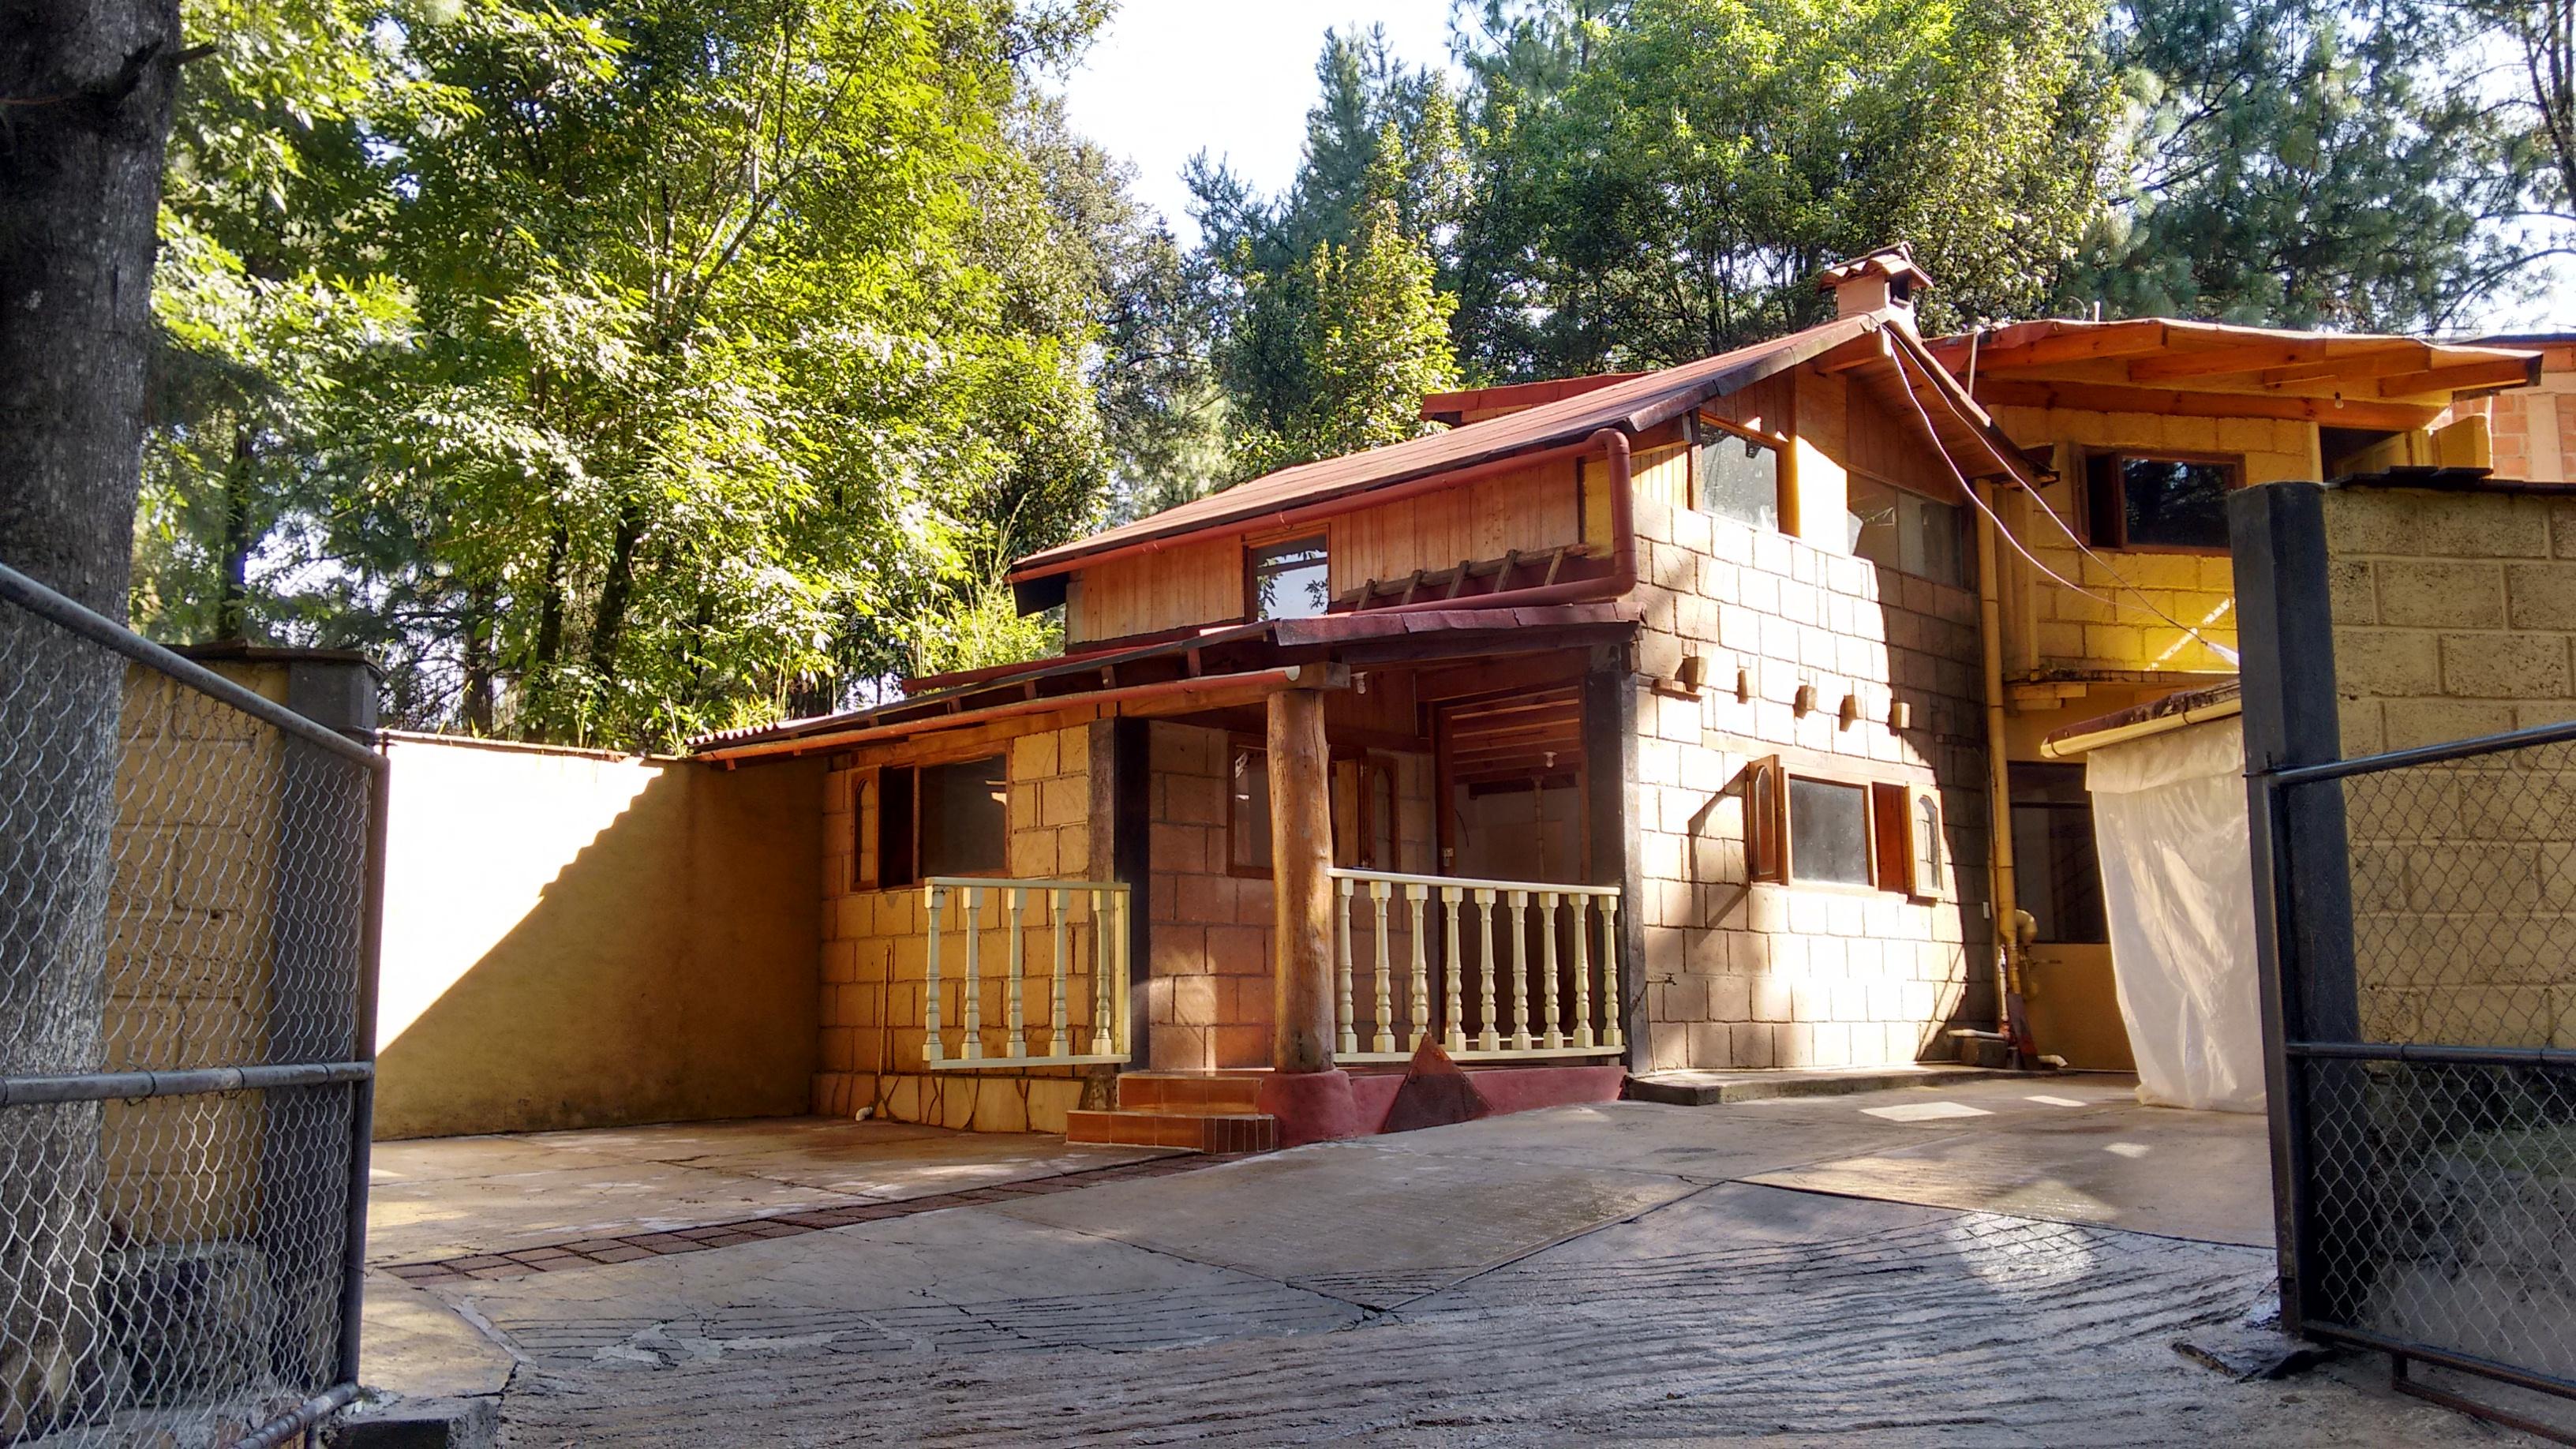 Casa en venta en valle de bravo valle de bravo goplaceit for Casas en valle de bravo